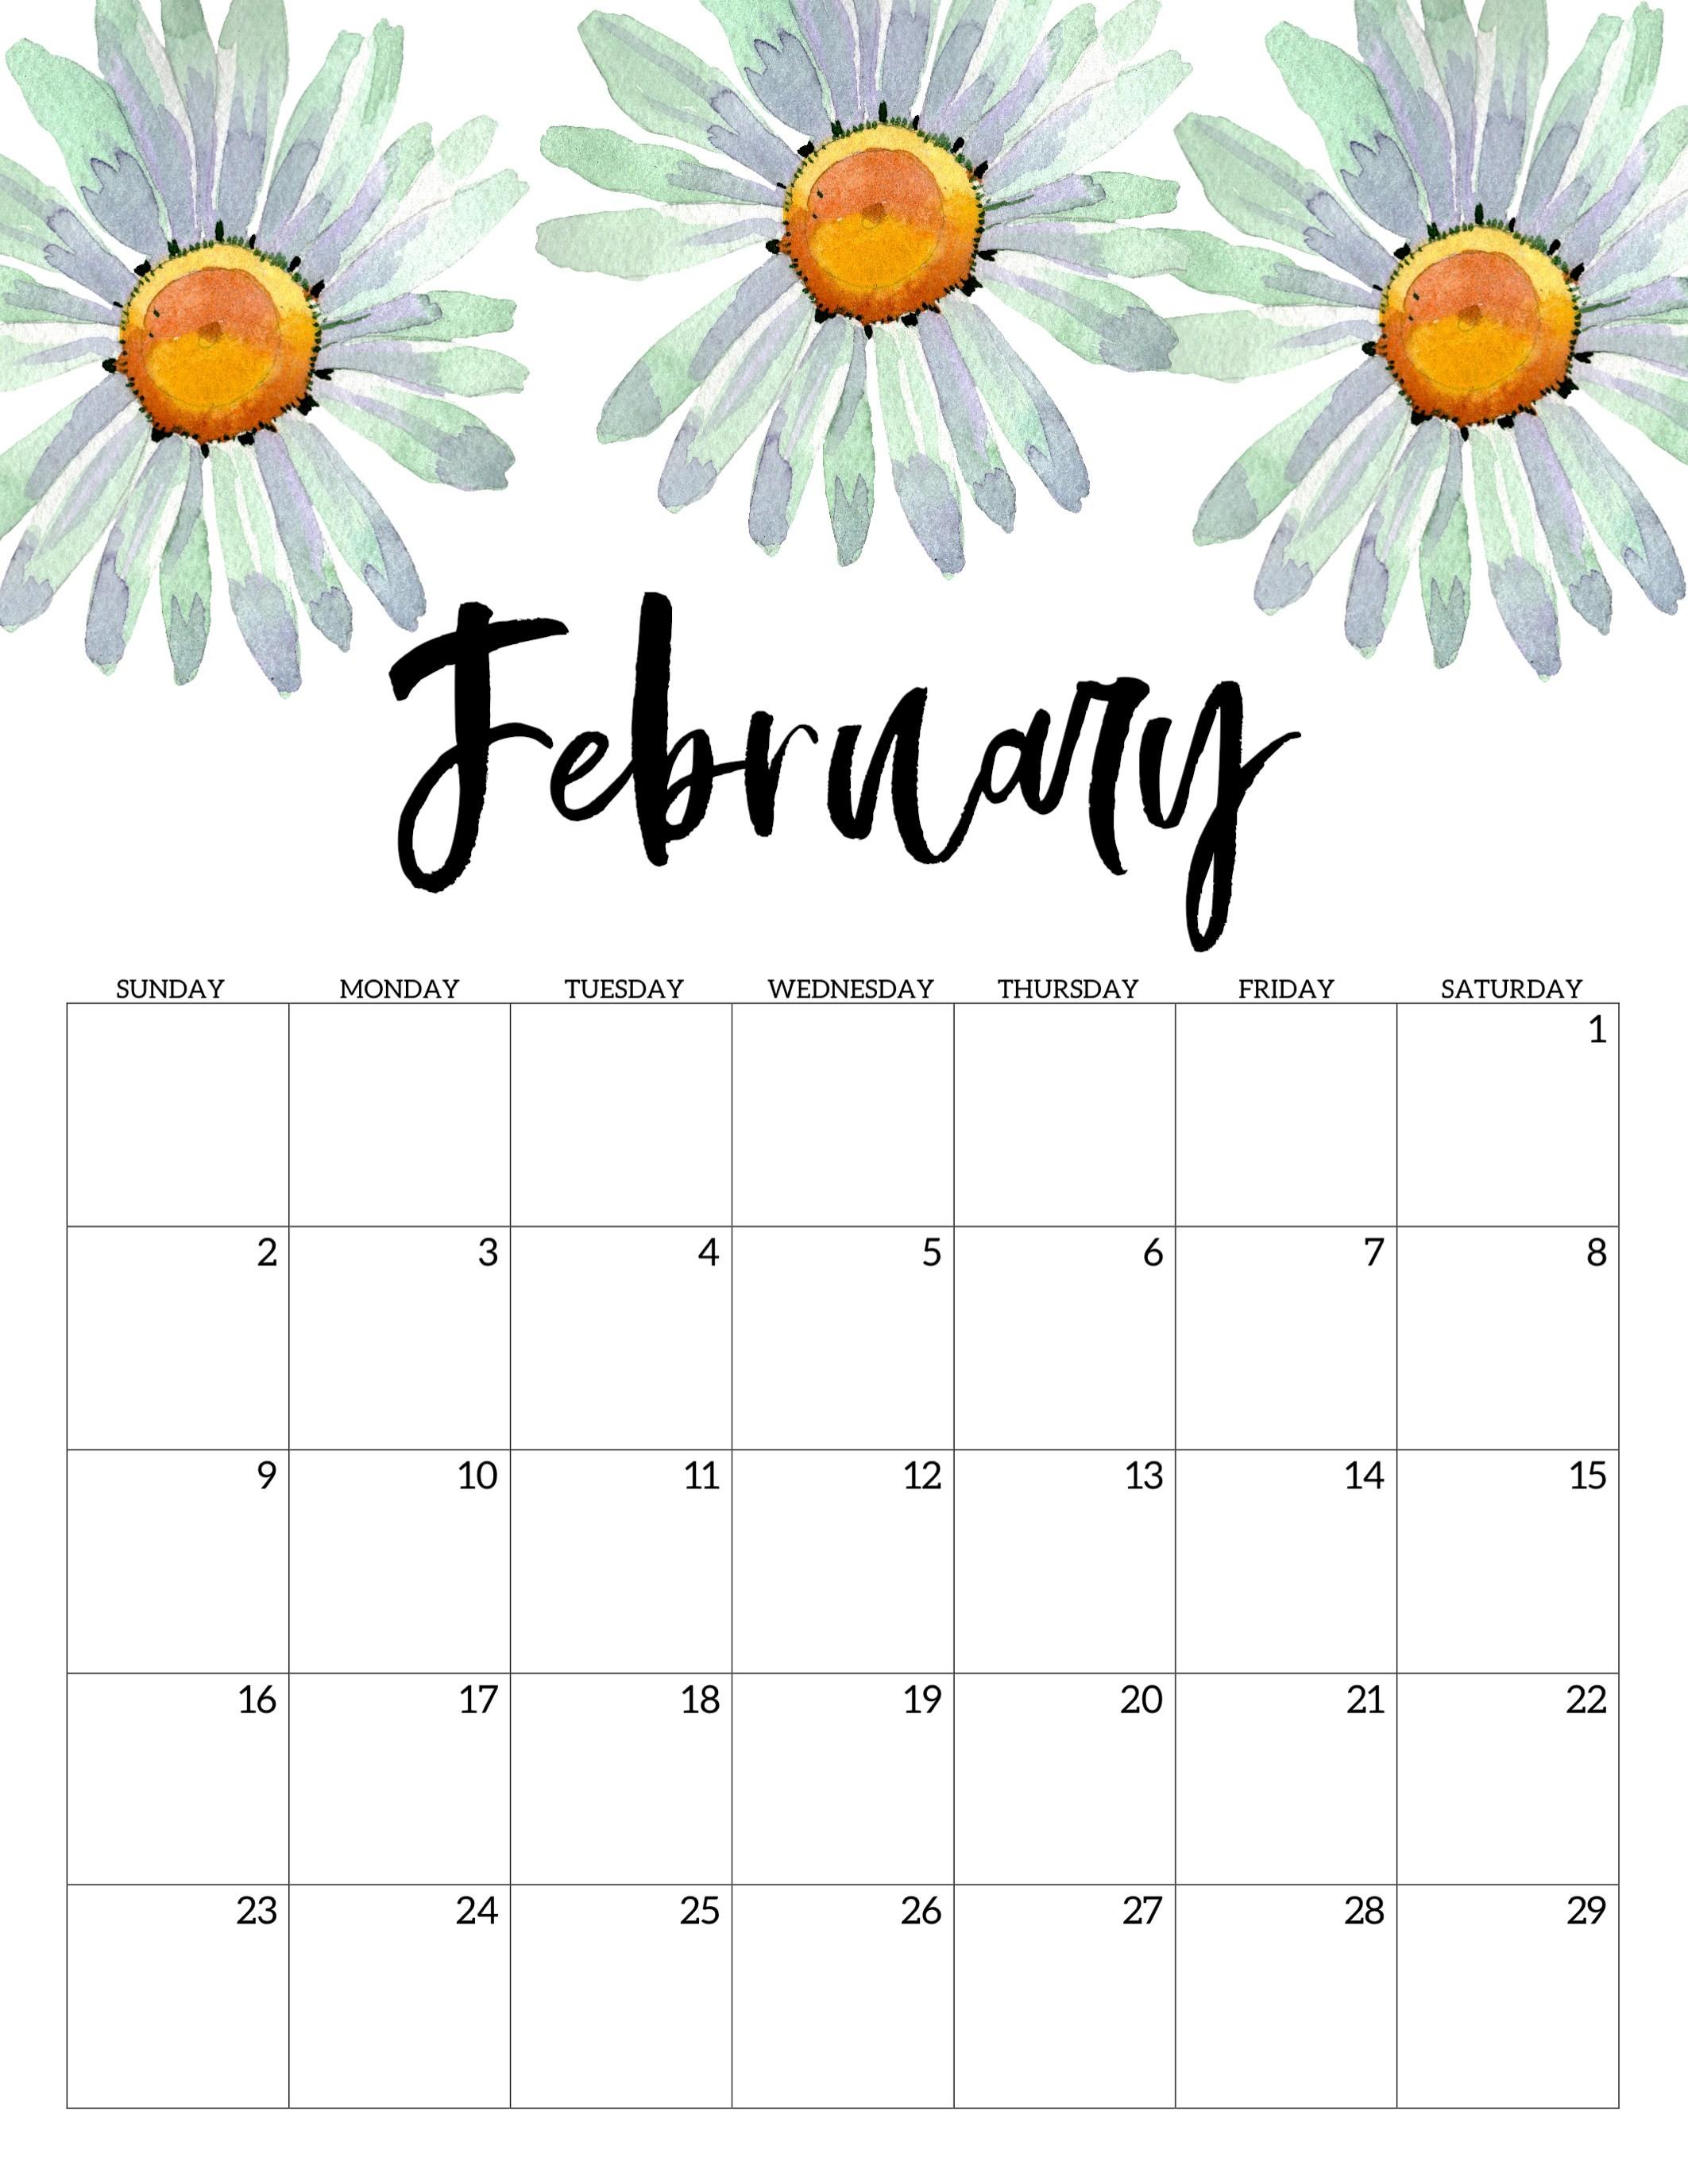 February 2020 Calendar Printable 2020 Free Printable Calendar Floral Paper Trail Design